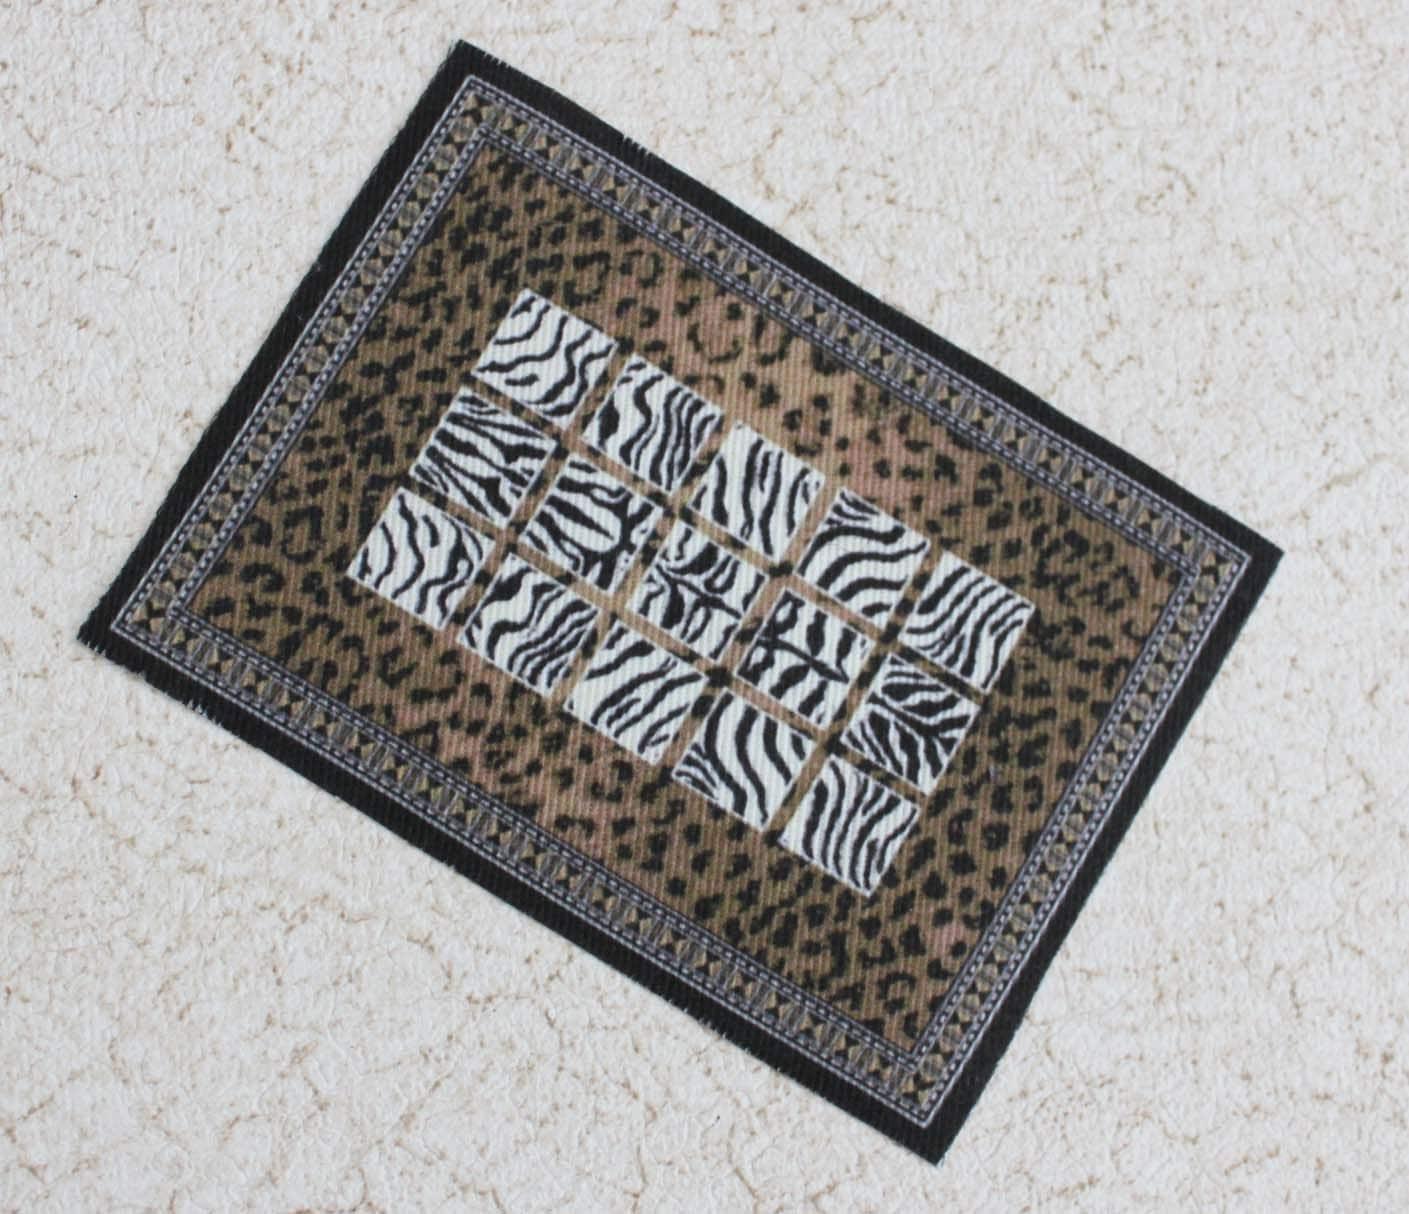 Miniature Rug Animal Print Cheetah Zebra Dollhouse One Twelfth